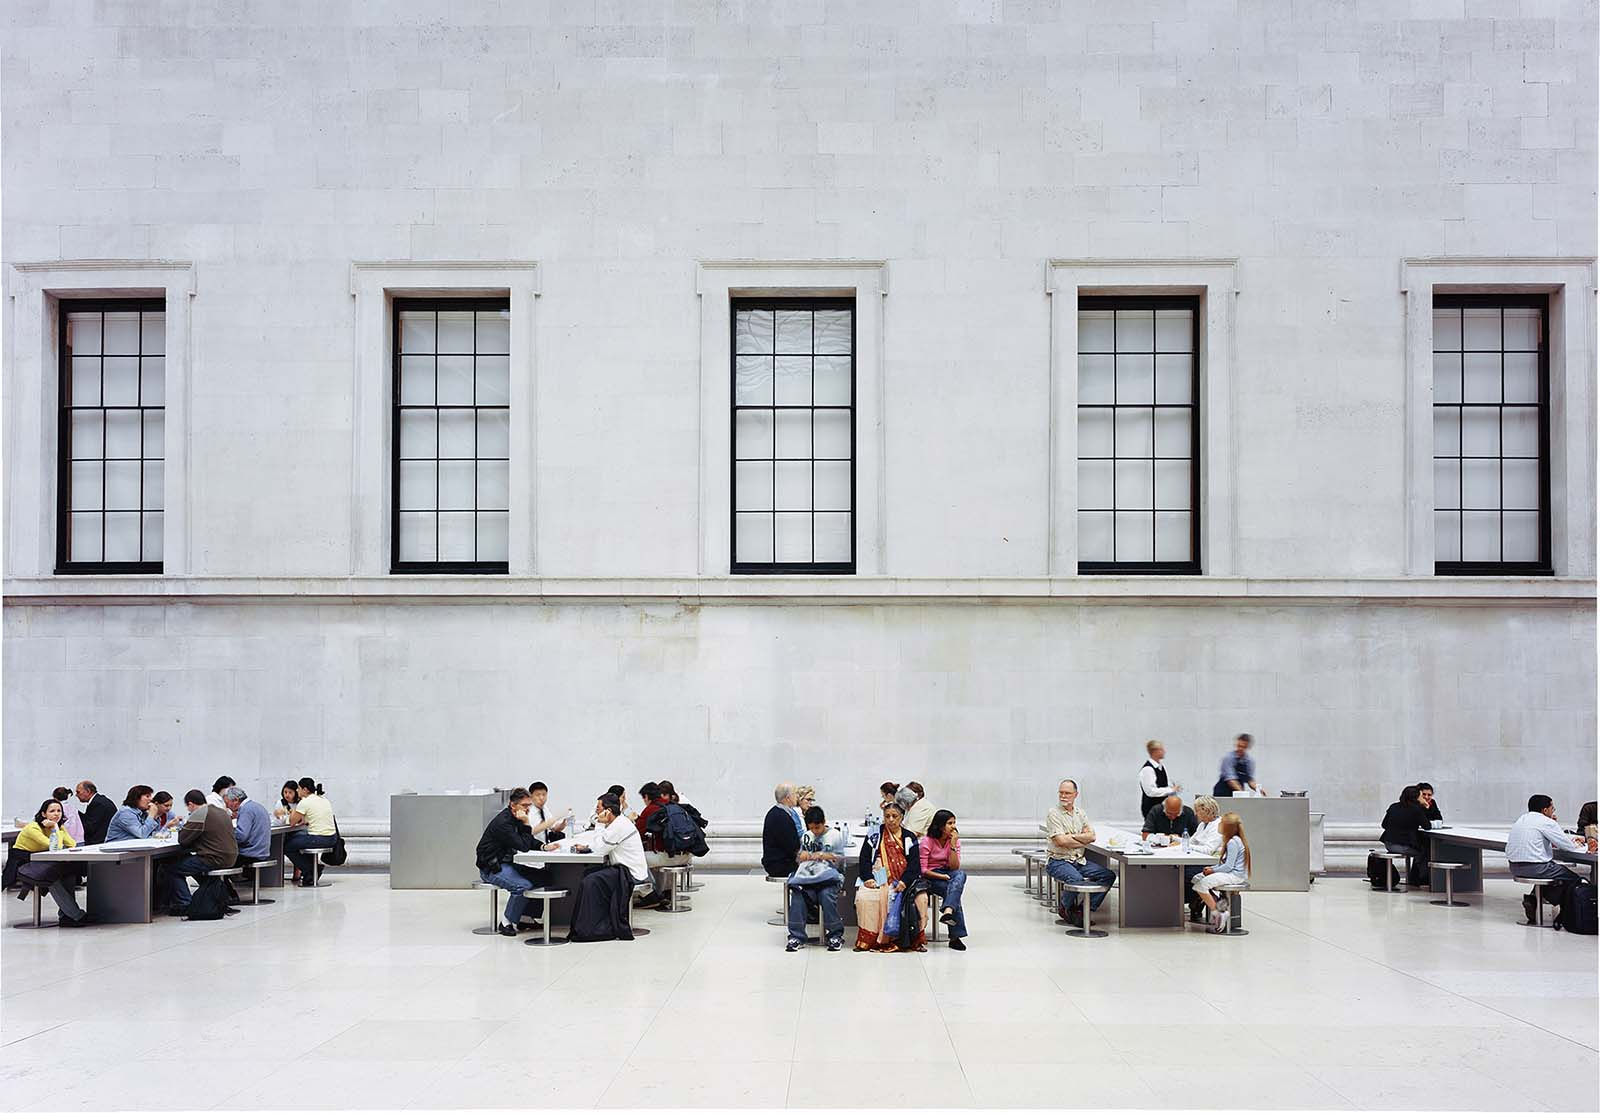 British Museum, London UK